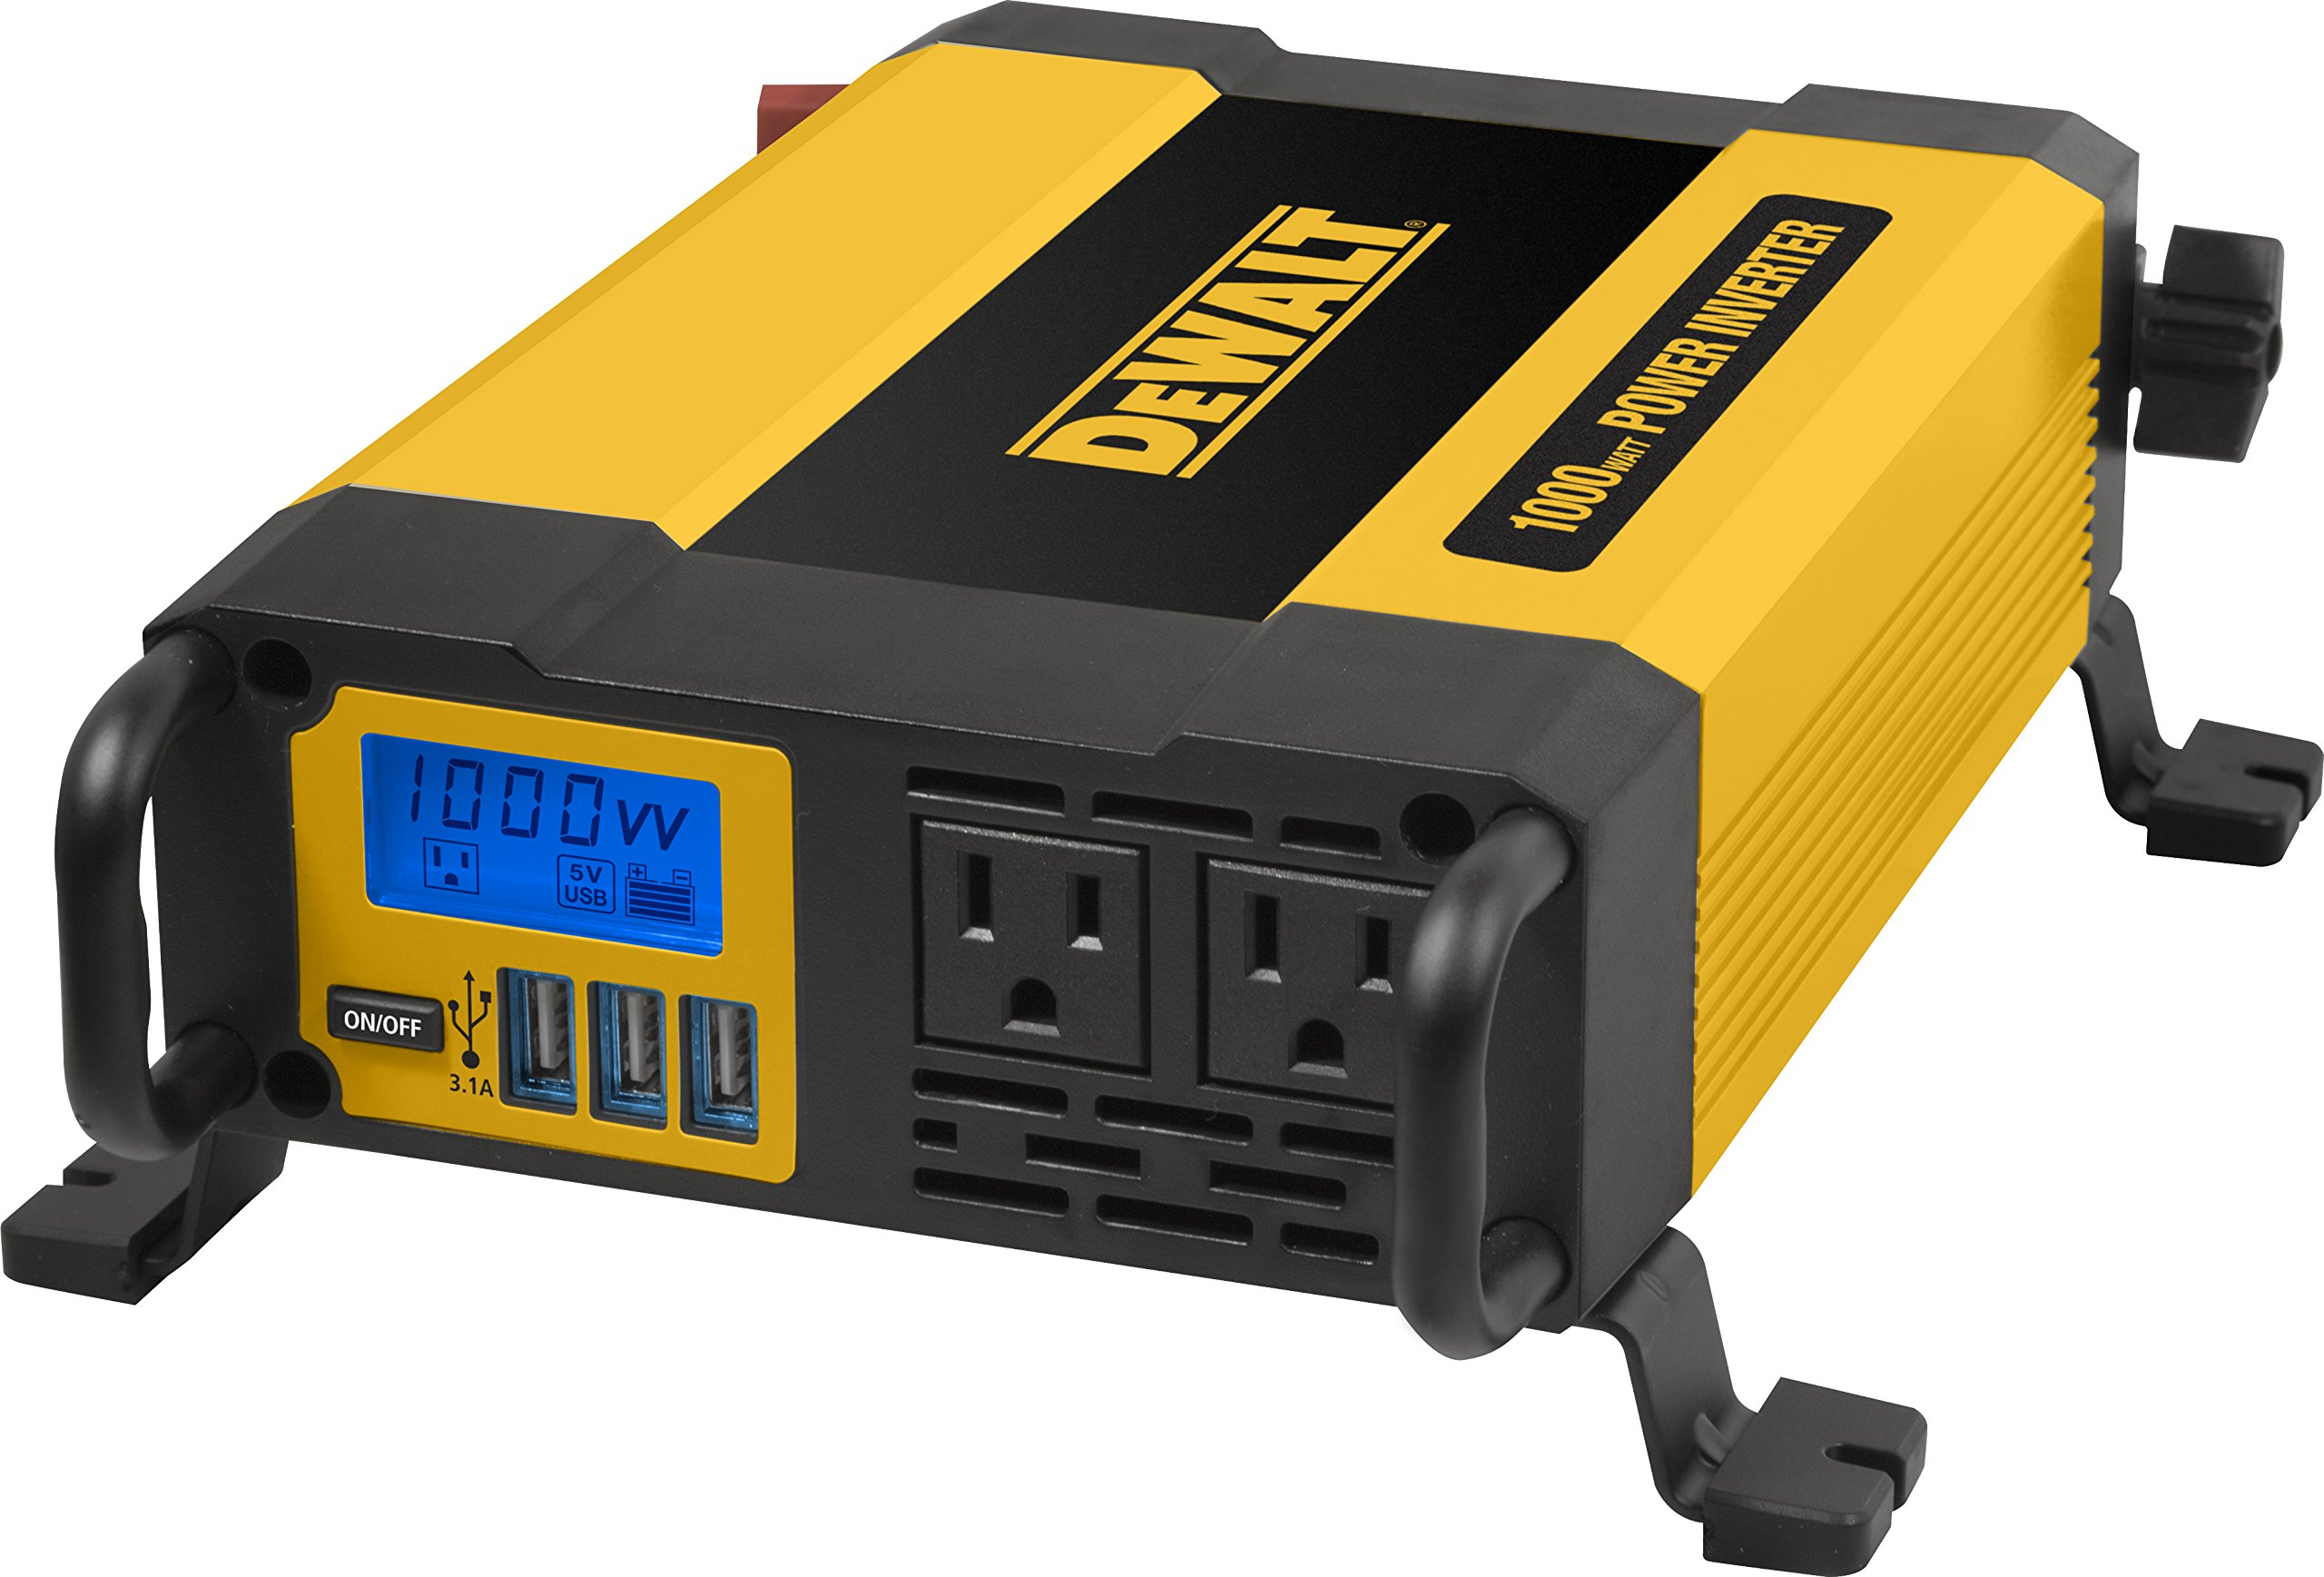 DEWALT DXAEPI1000 Power Inverter Continuous